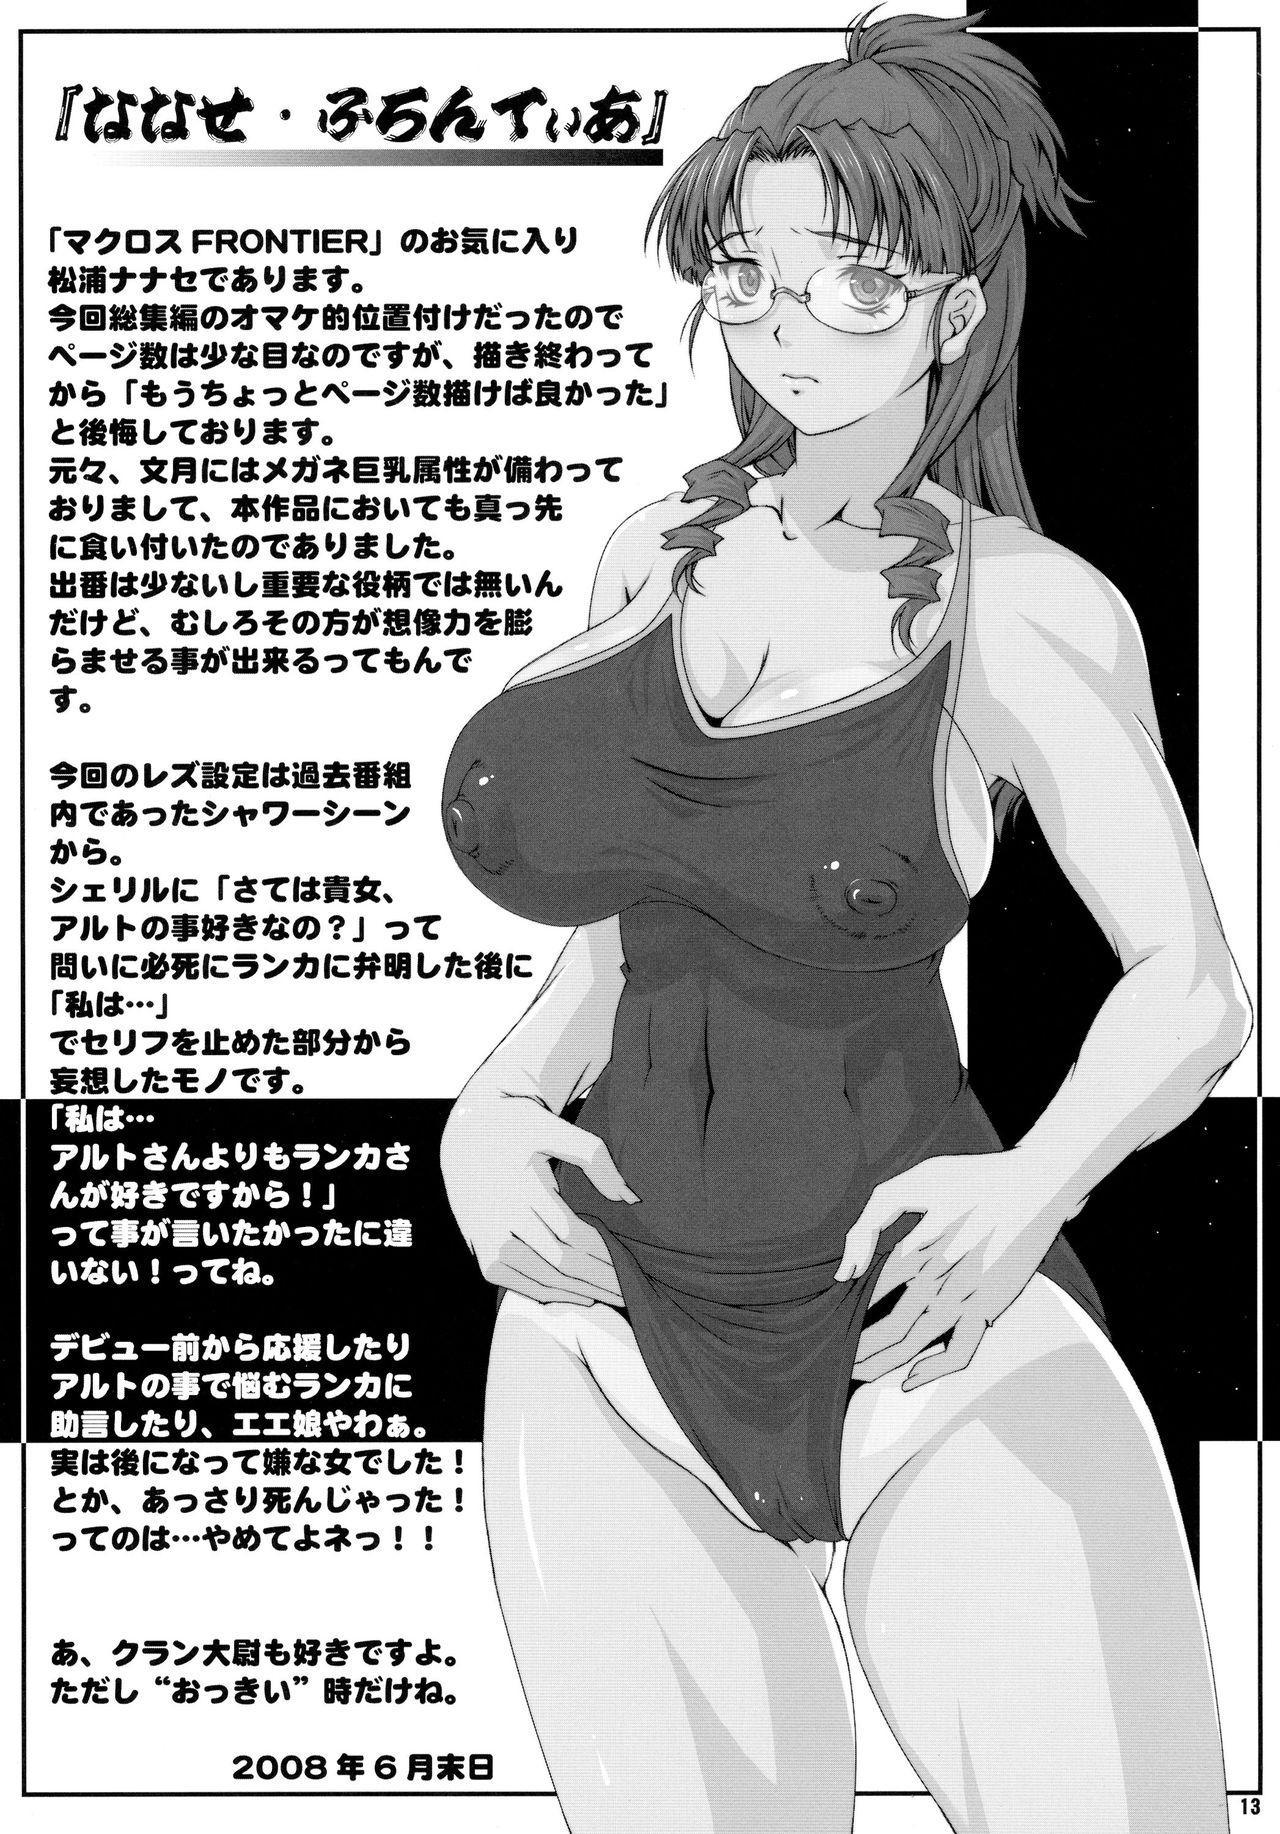 Misoka no 5 12